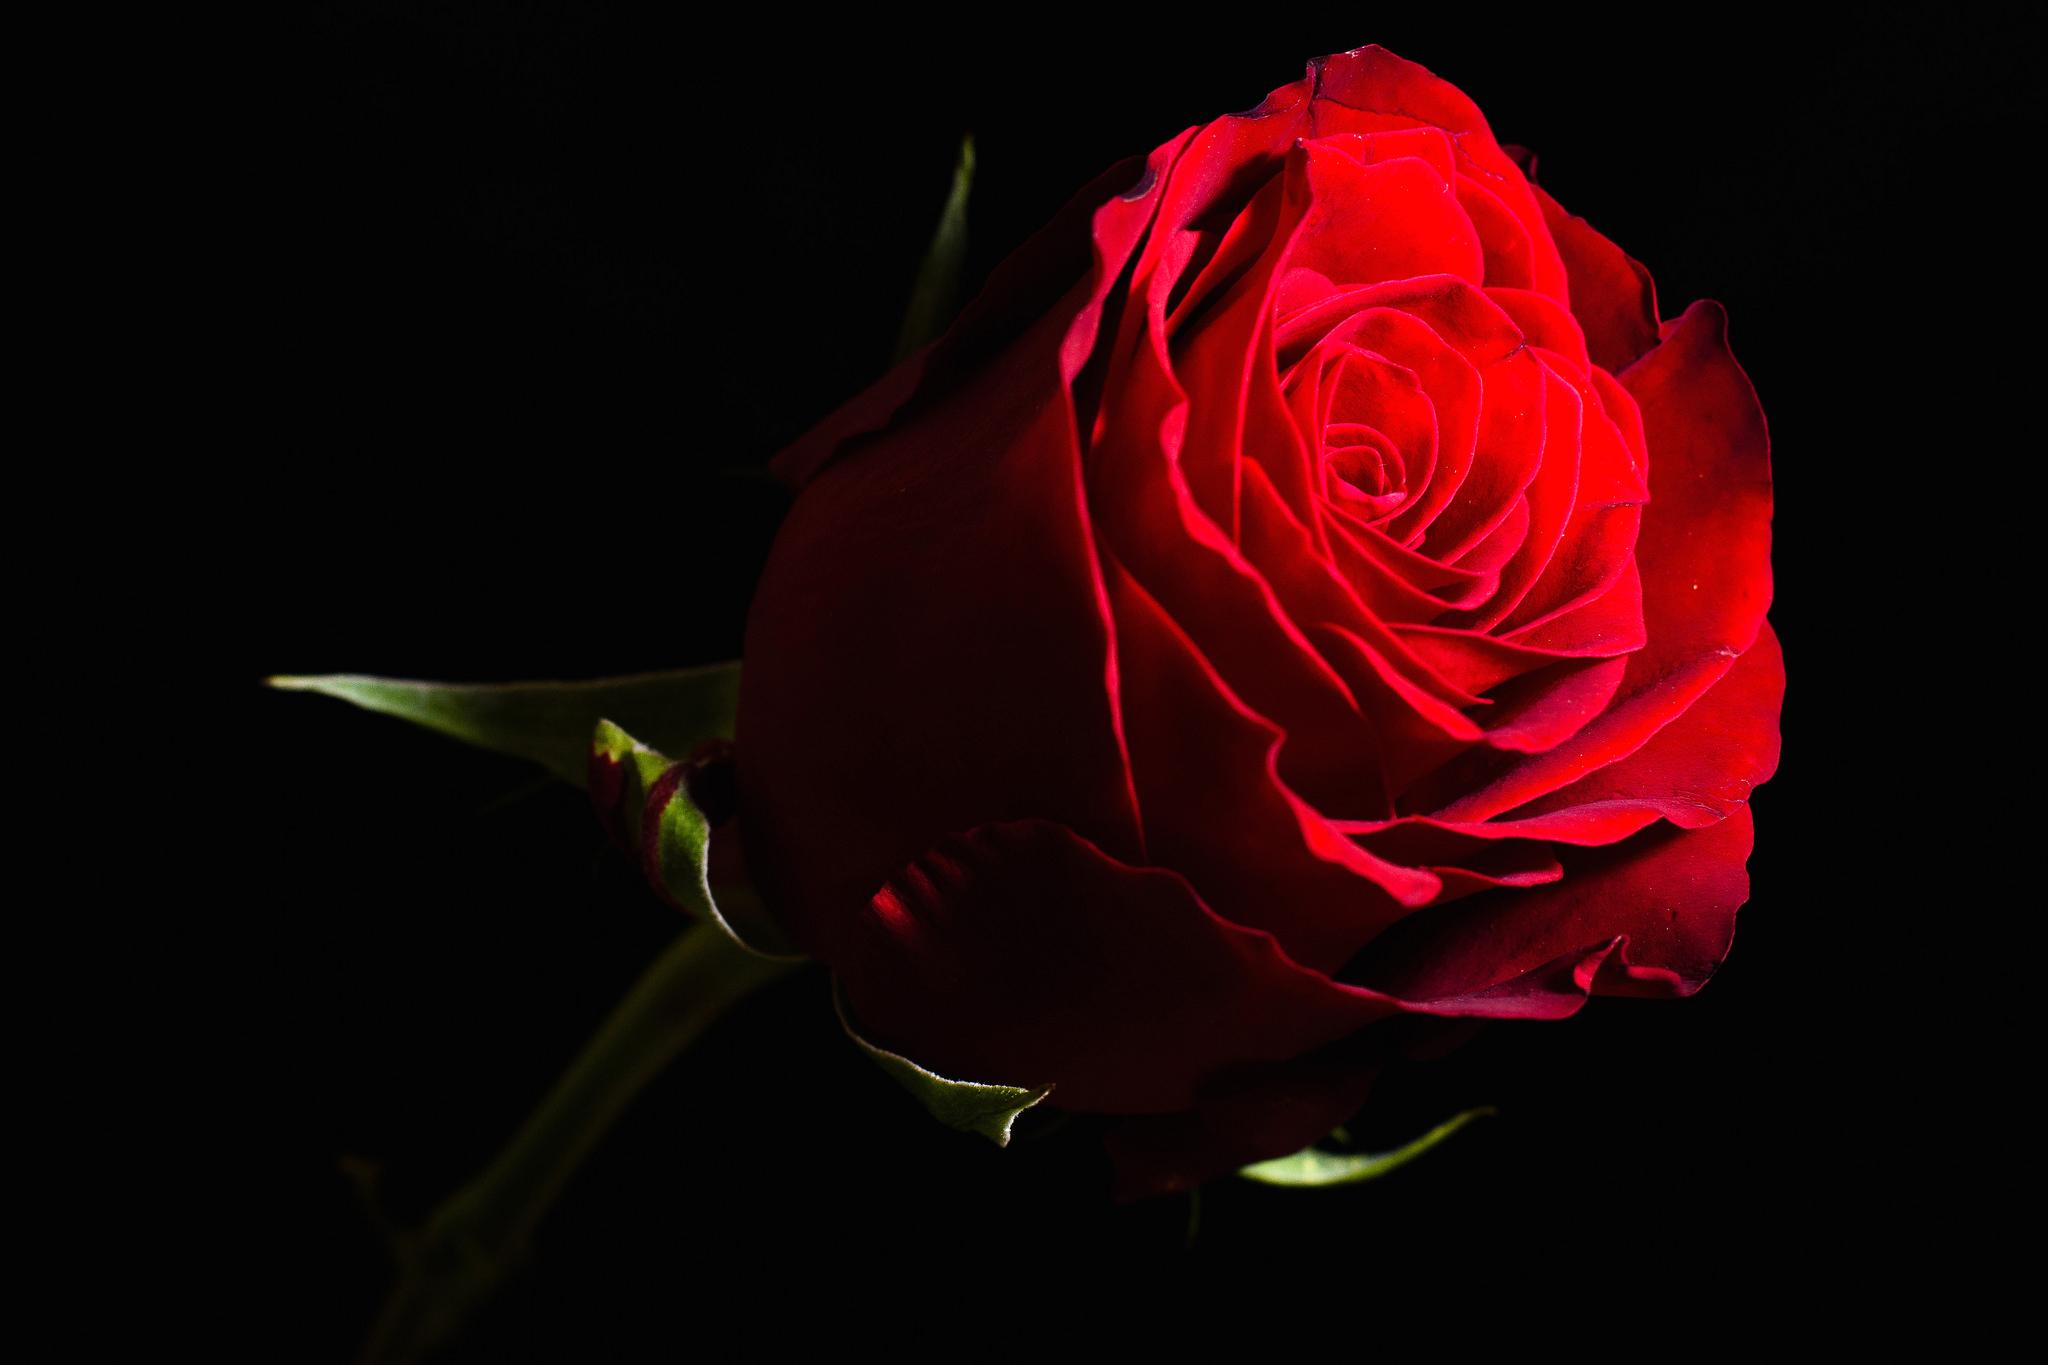 фото роз на темном фоне соответствуют